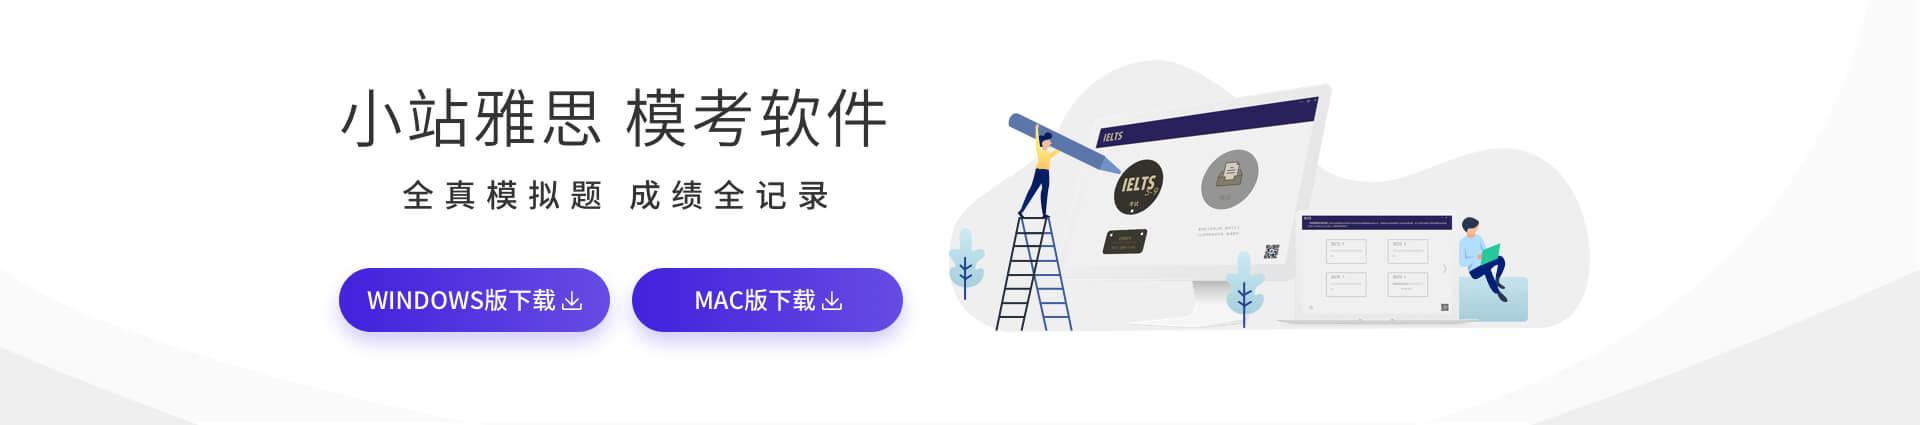 ope电竞下载模考软件免费下载